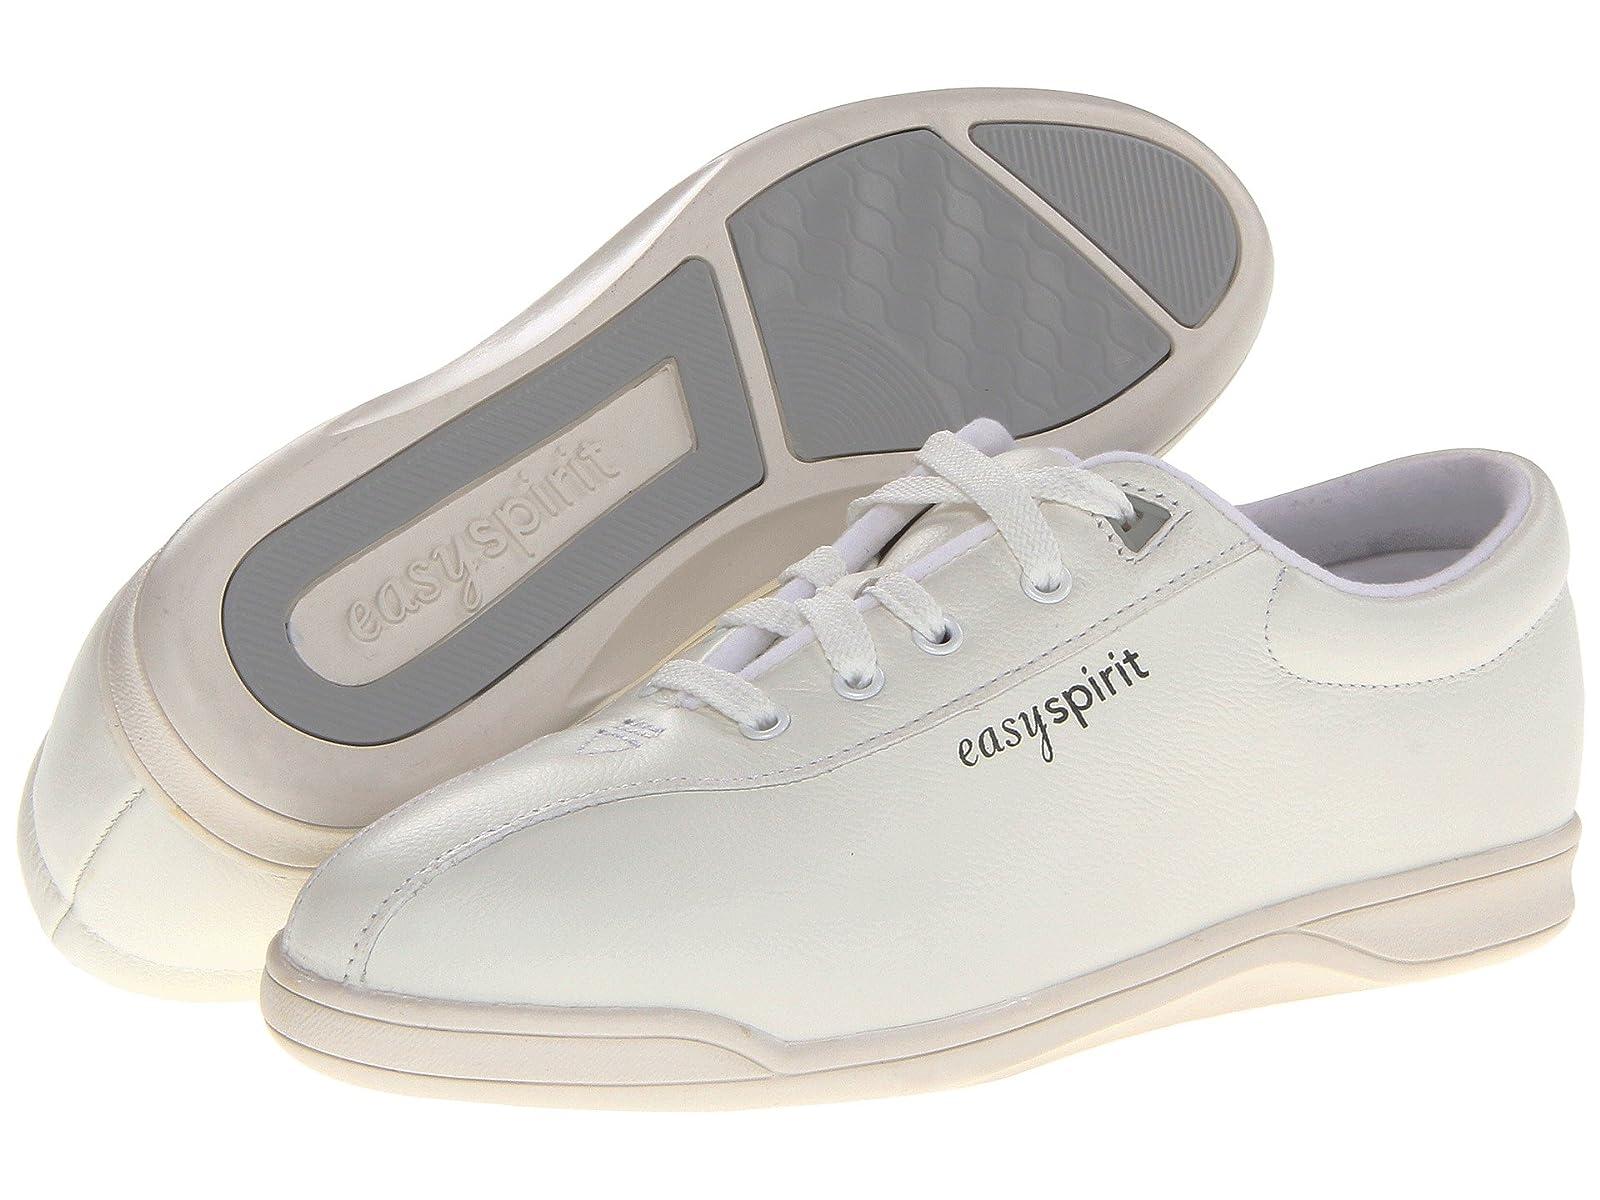 Easy Spirit AP1Atmospheric grades have affordable shoes